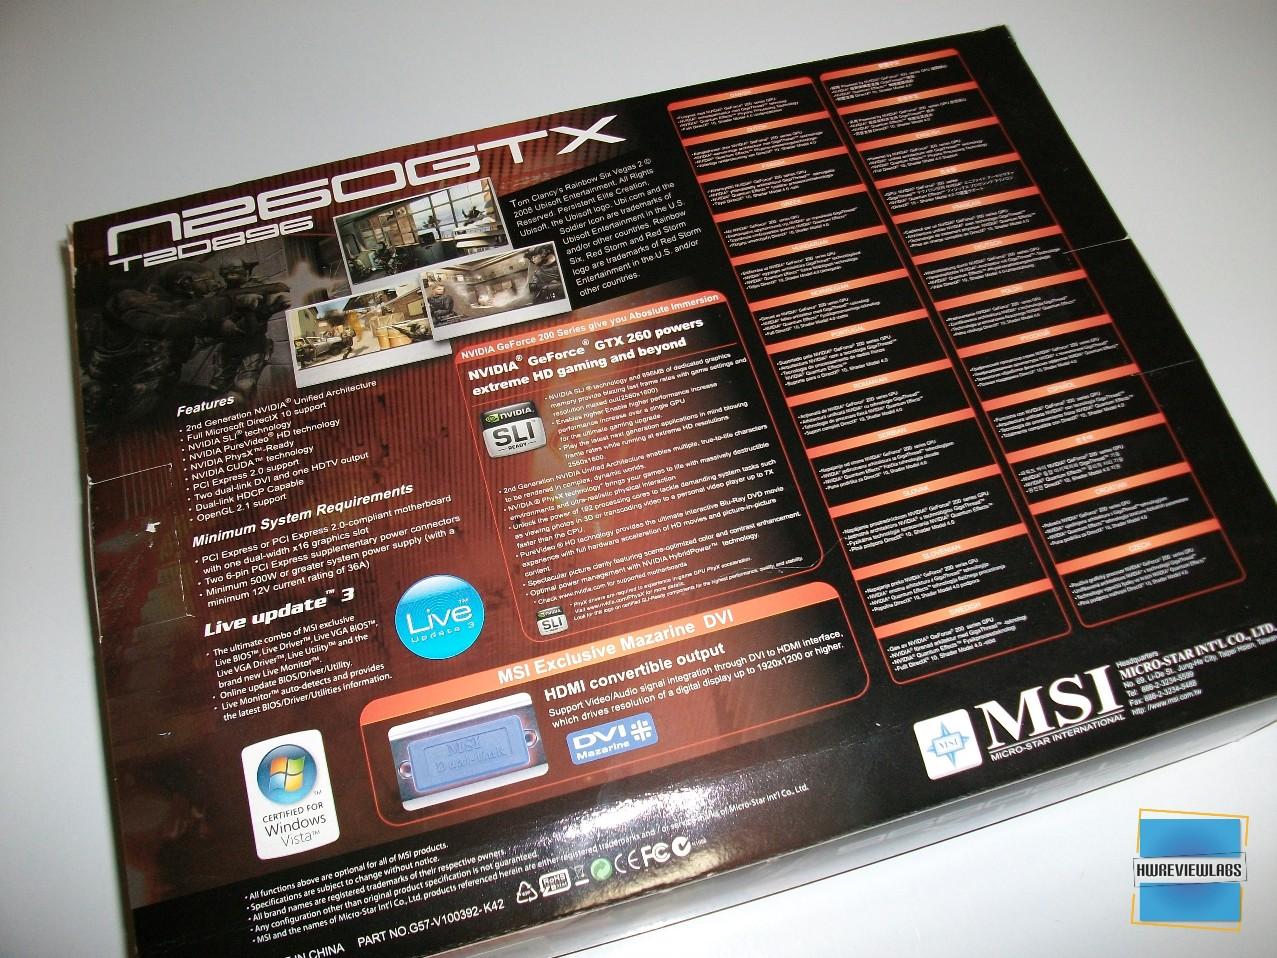 Msi N260GTX-T2D896-OC review